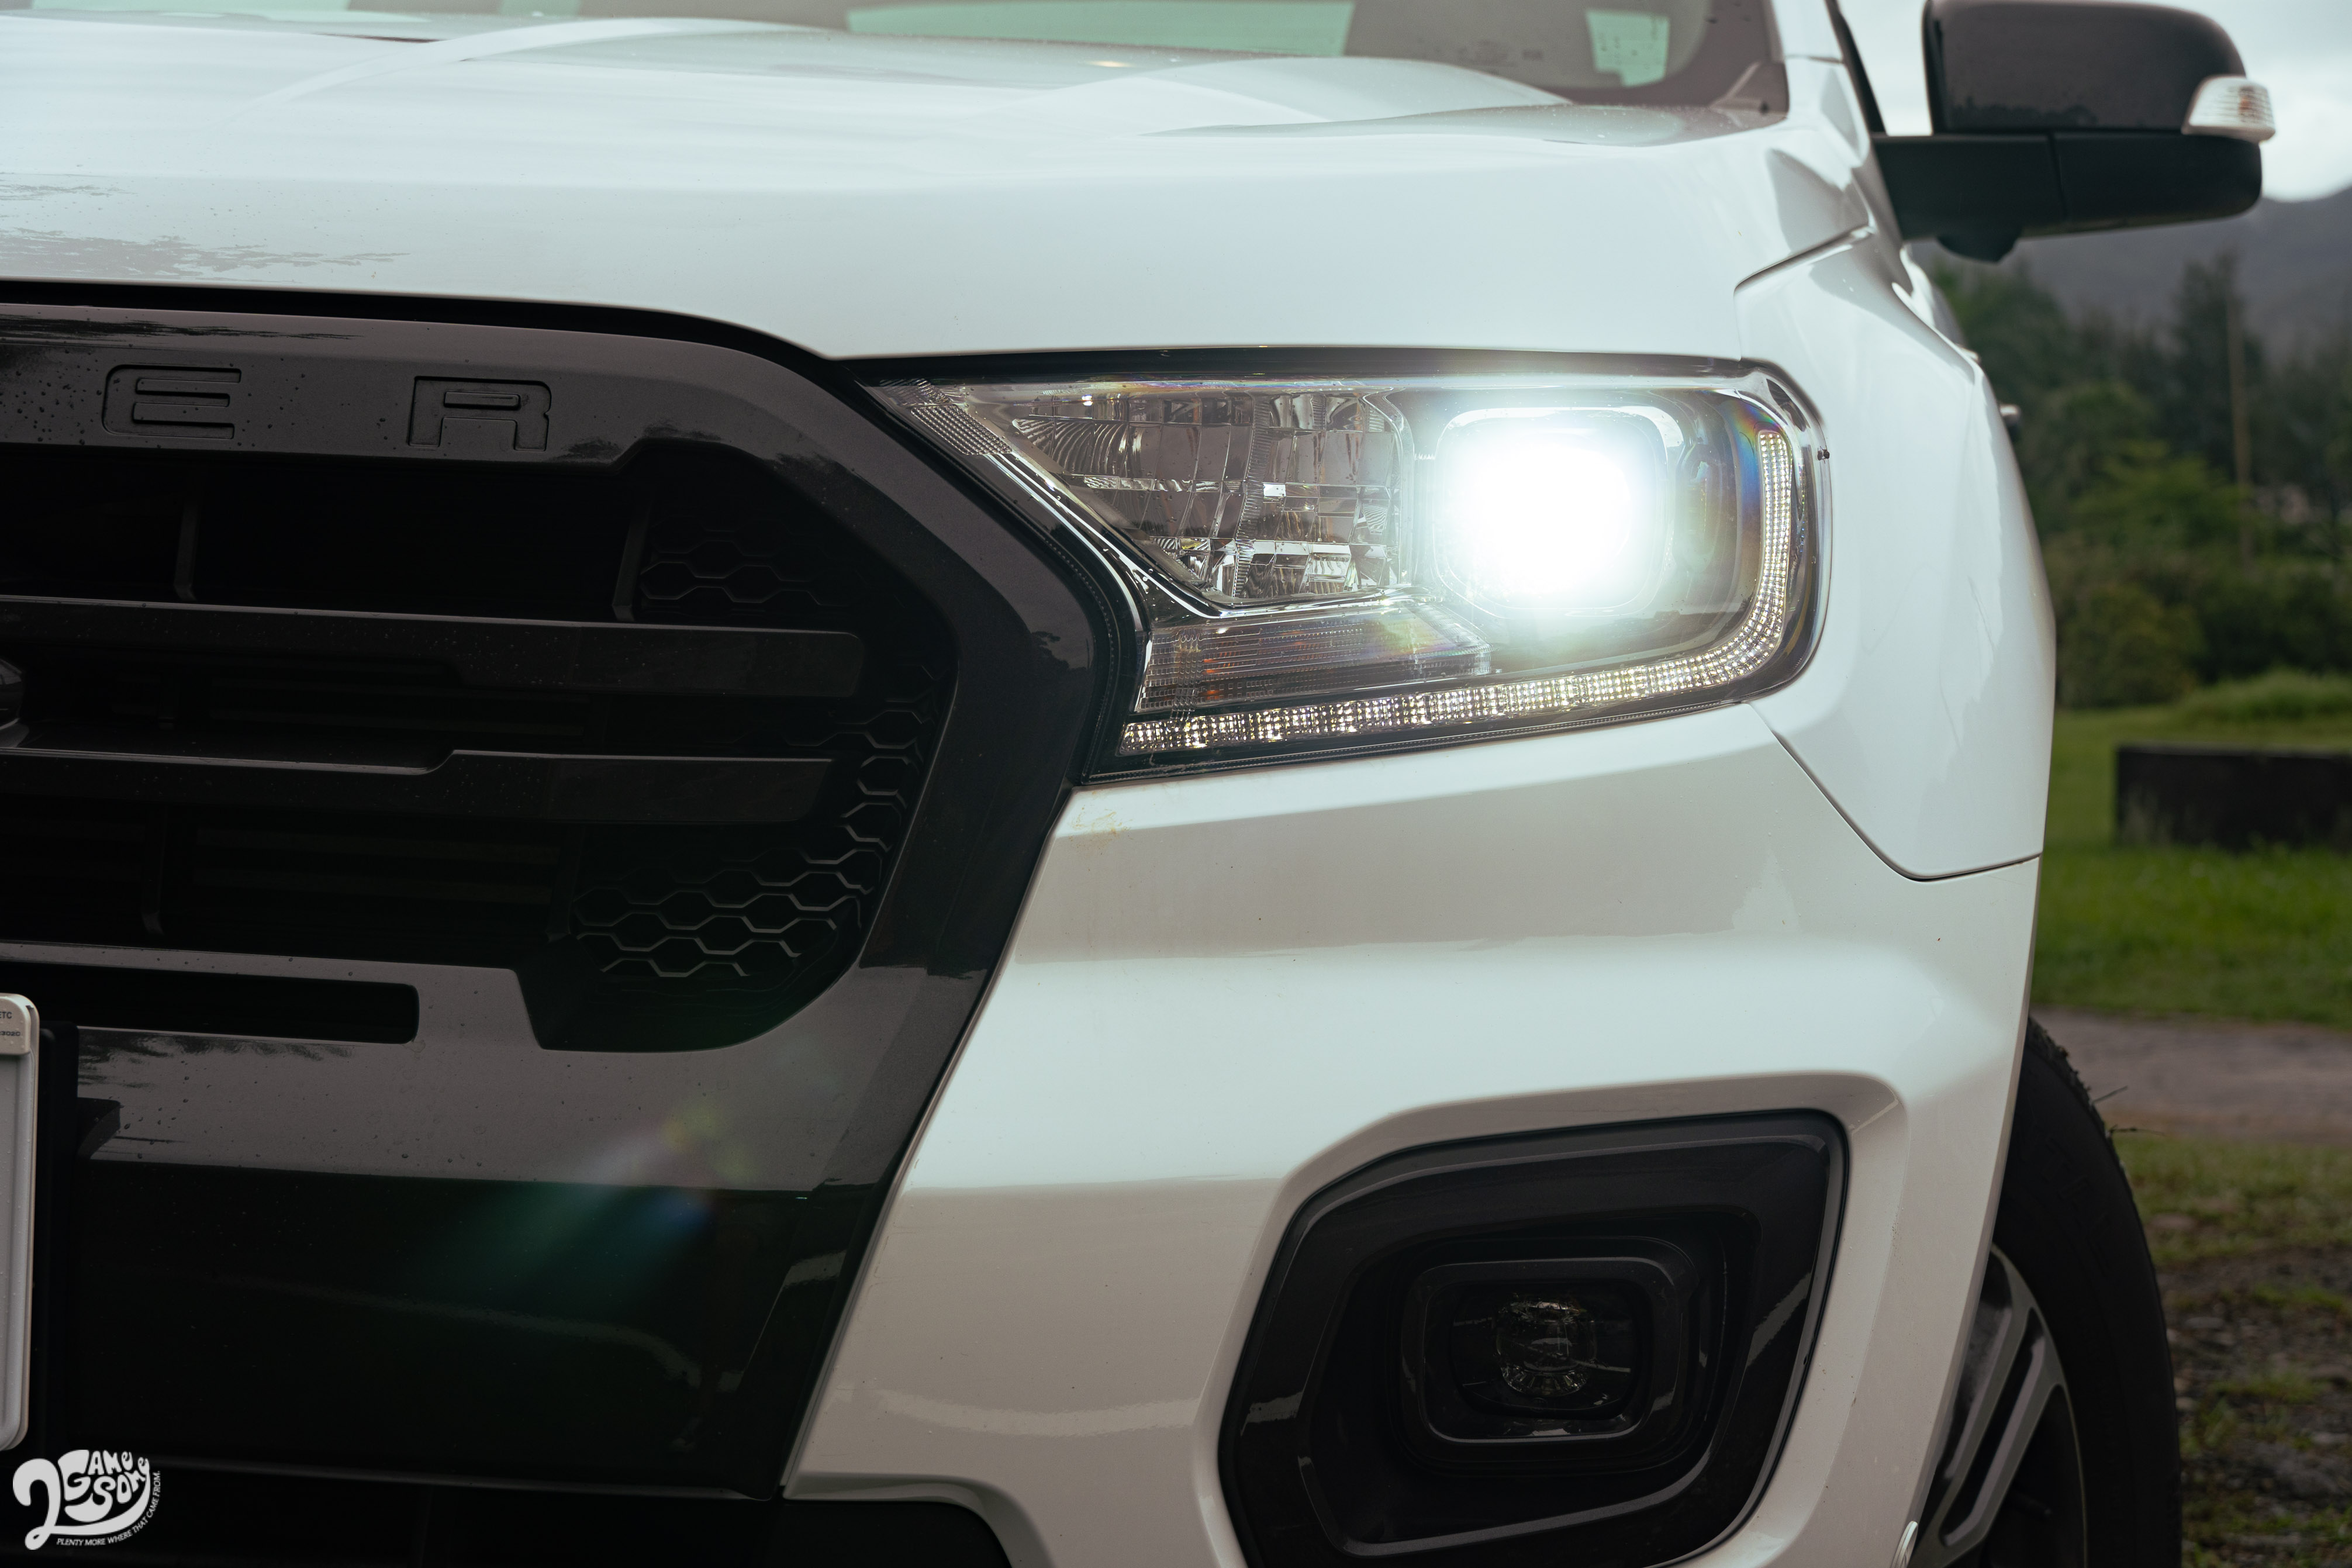 LED 日行燈與 LED 魚眼頭燈為運動型配備。